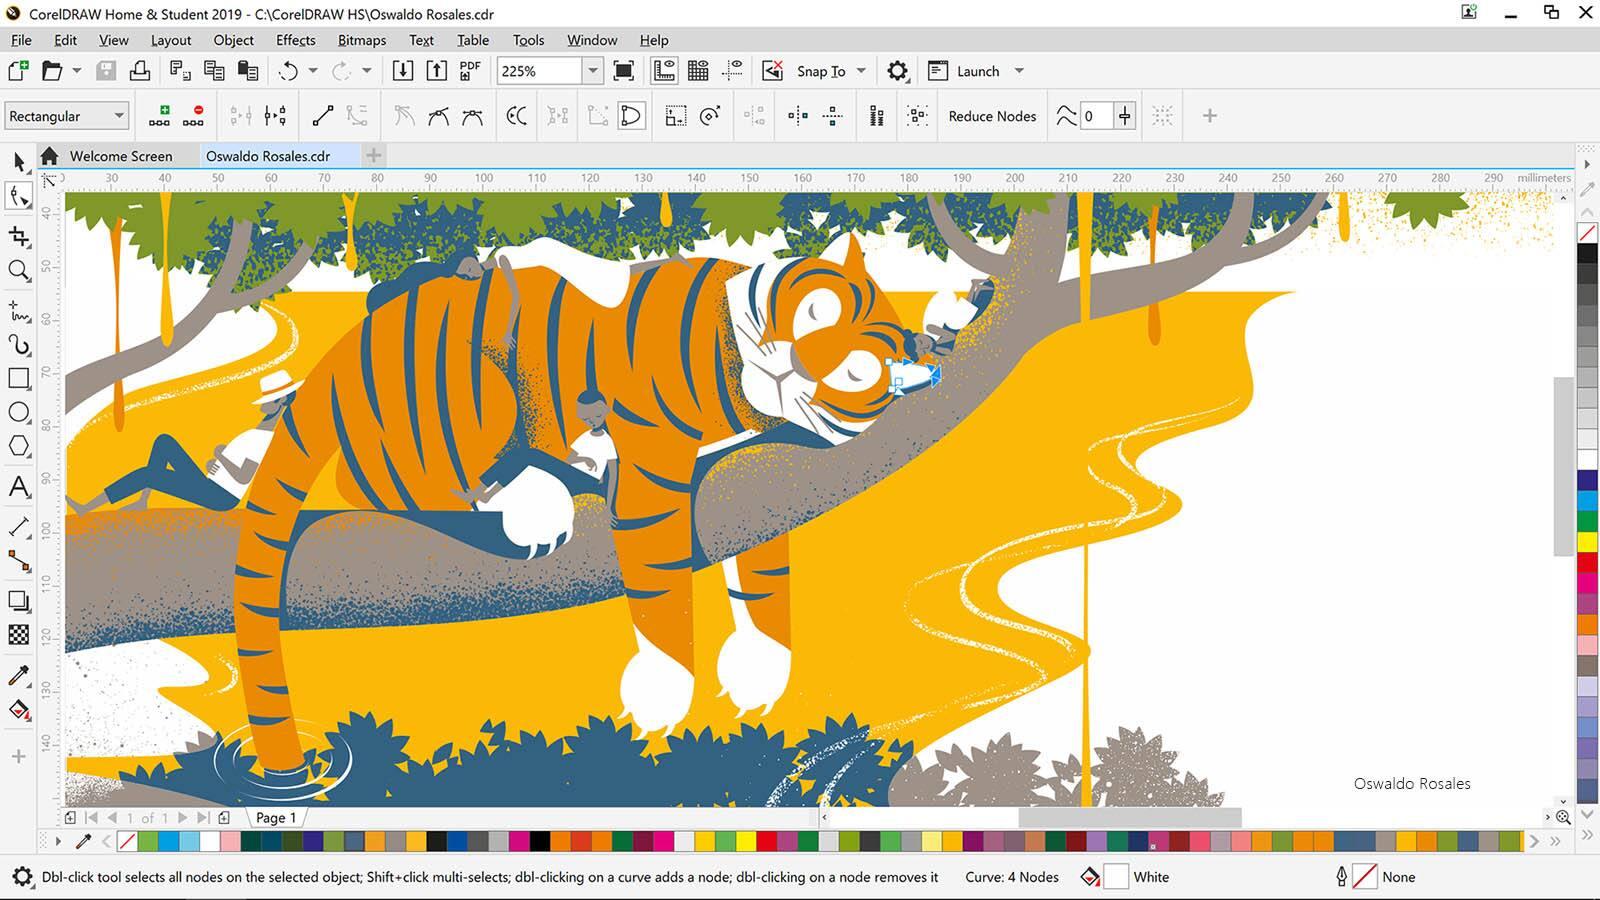 Graphic design software - CorelDRAW Home & Student Suite 2019